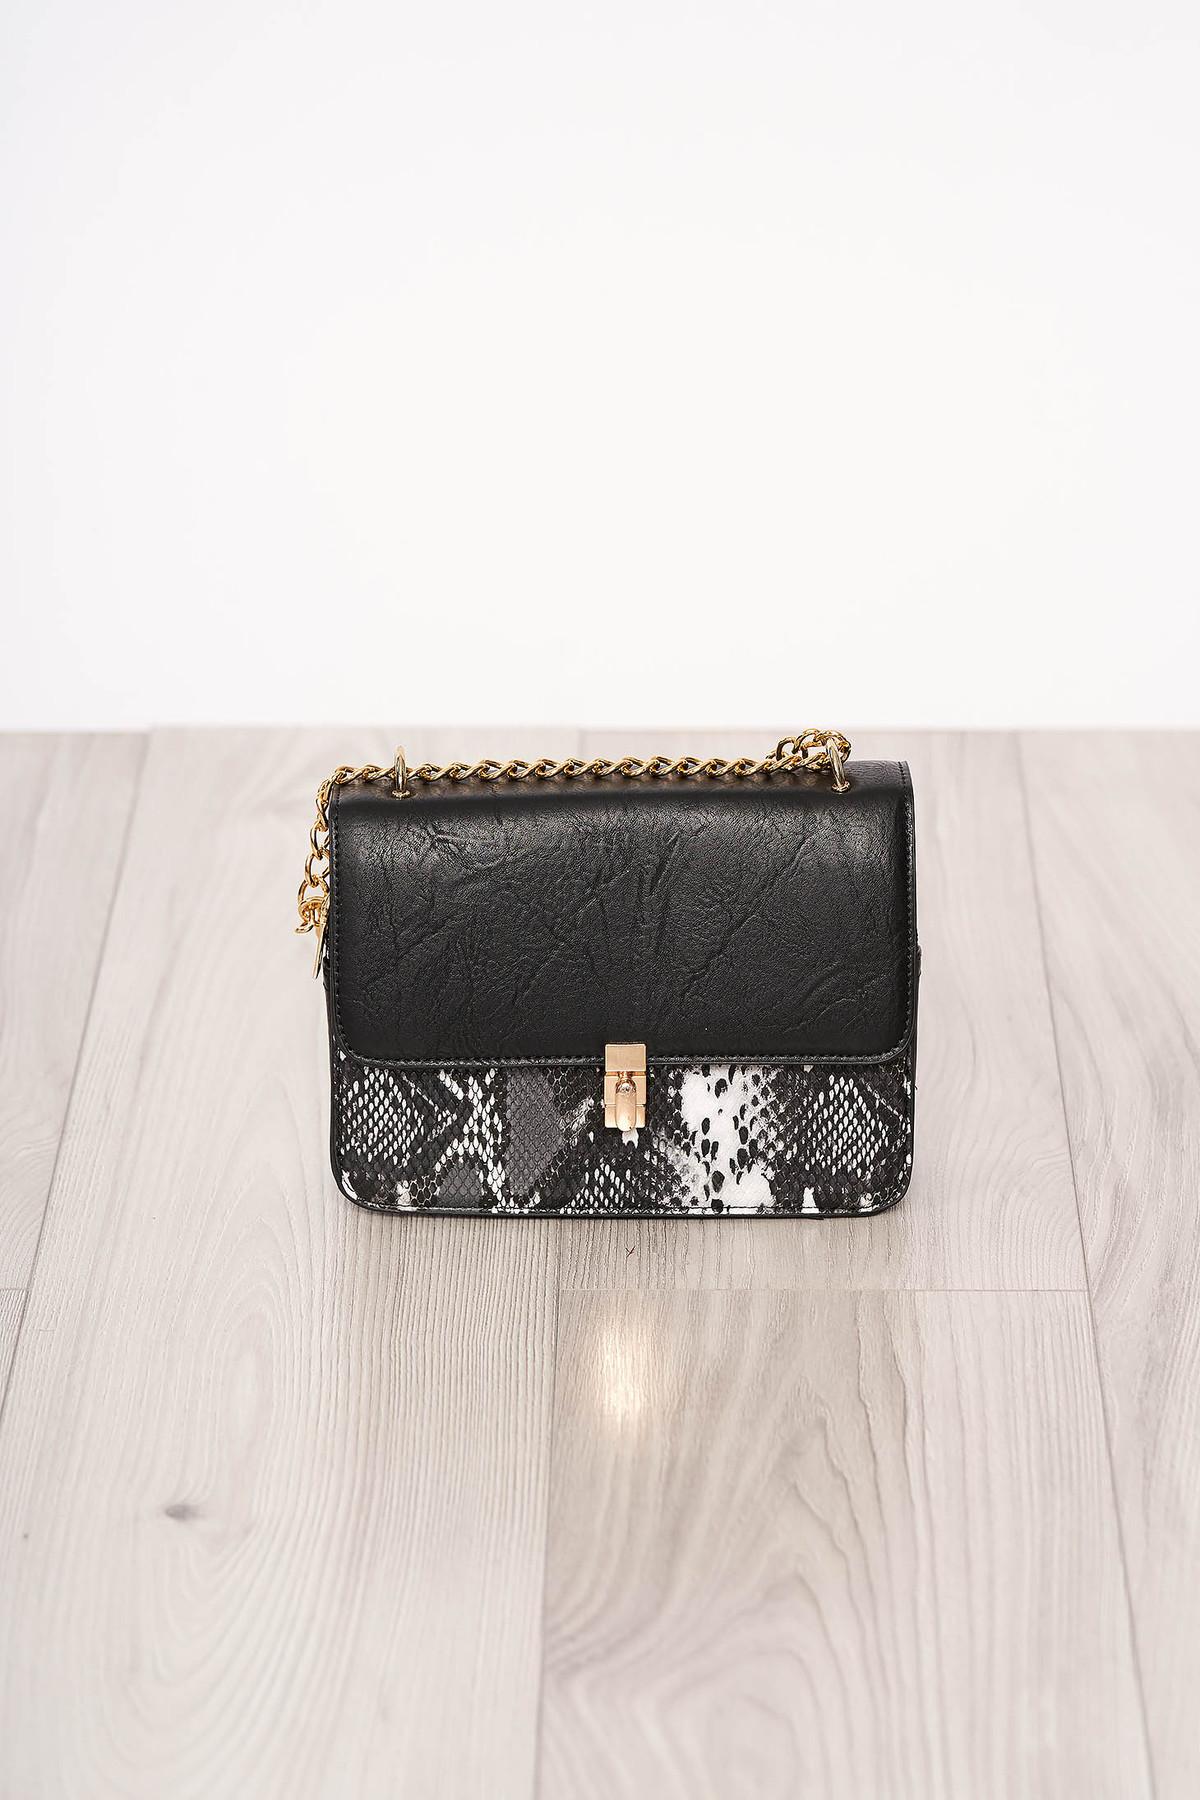 Geanta dama SunShine neagra material din piele ecologica cu animal print cu maner lung tip lantisor accesorizata cu o catarama